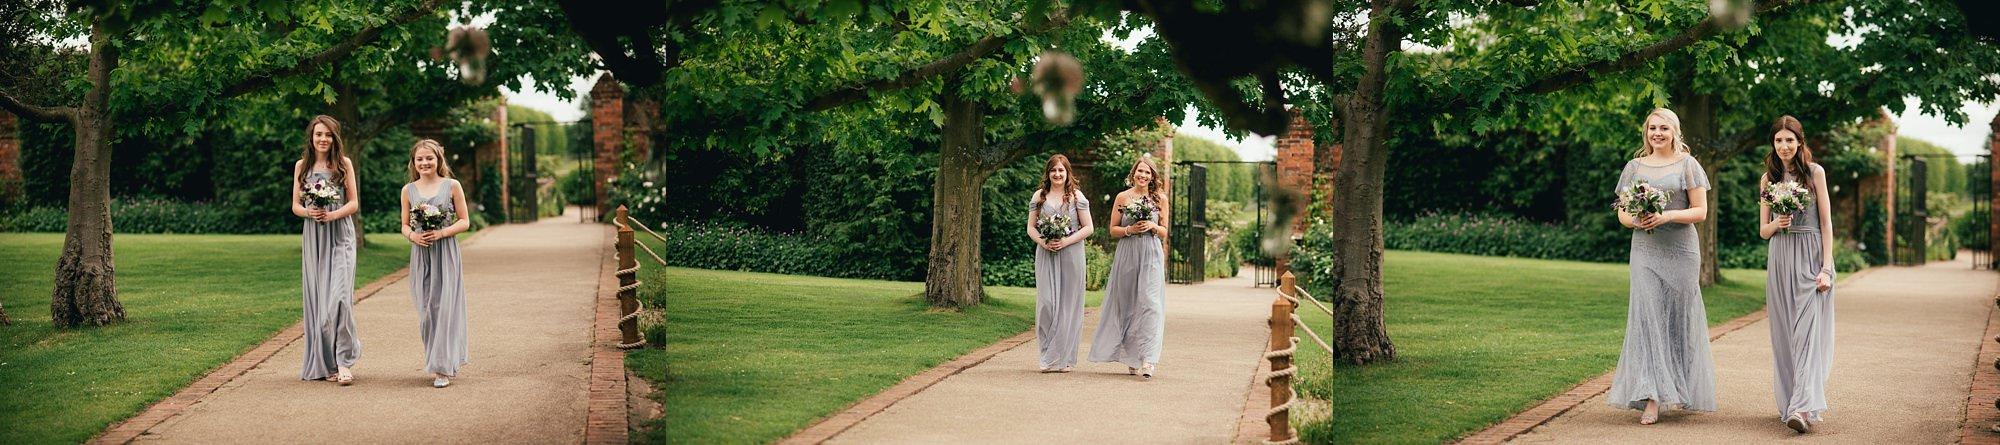 Gaynes Park Wedding Photographer-55